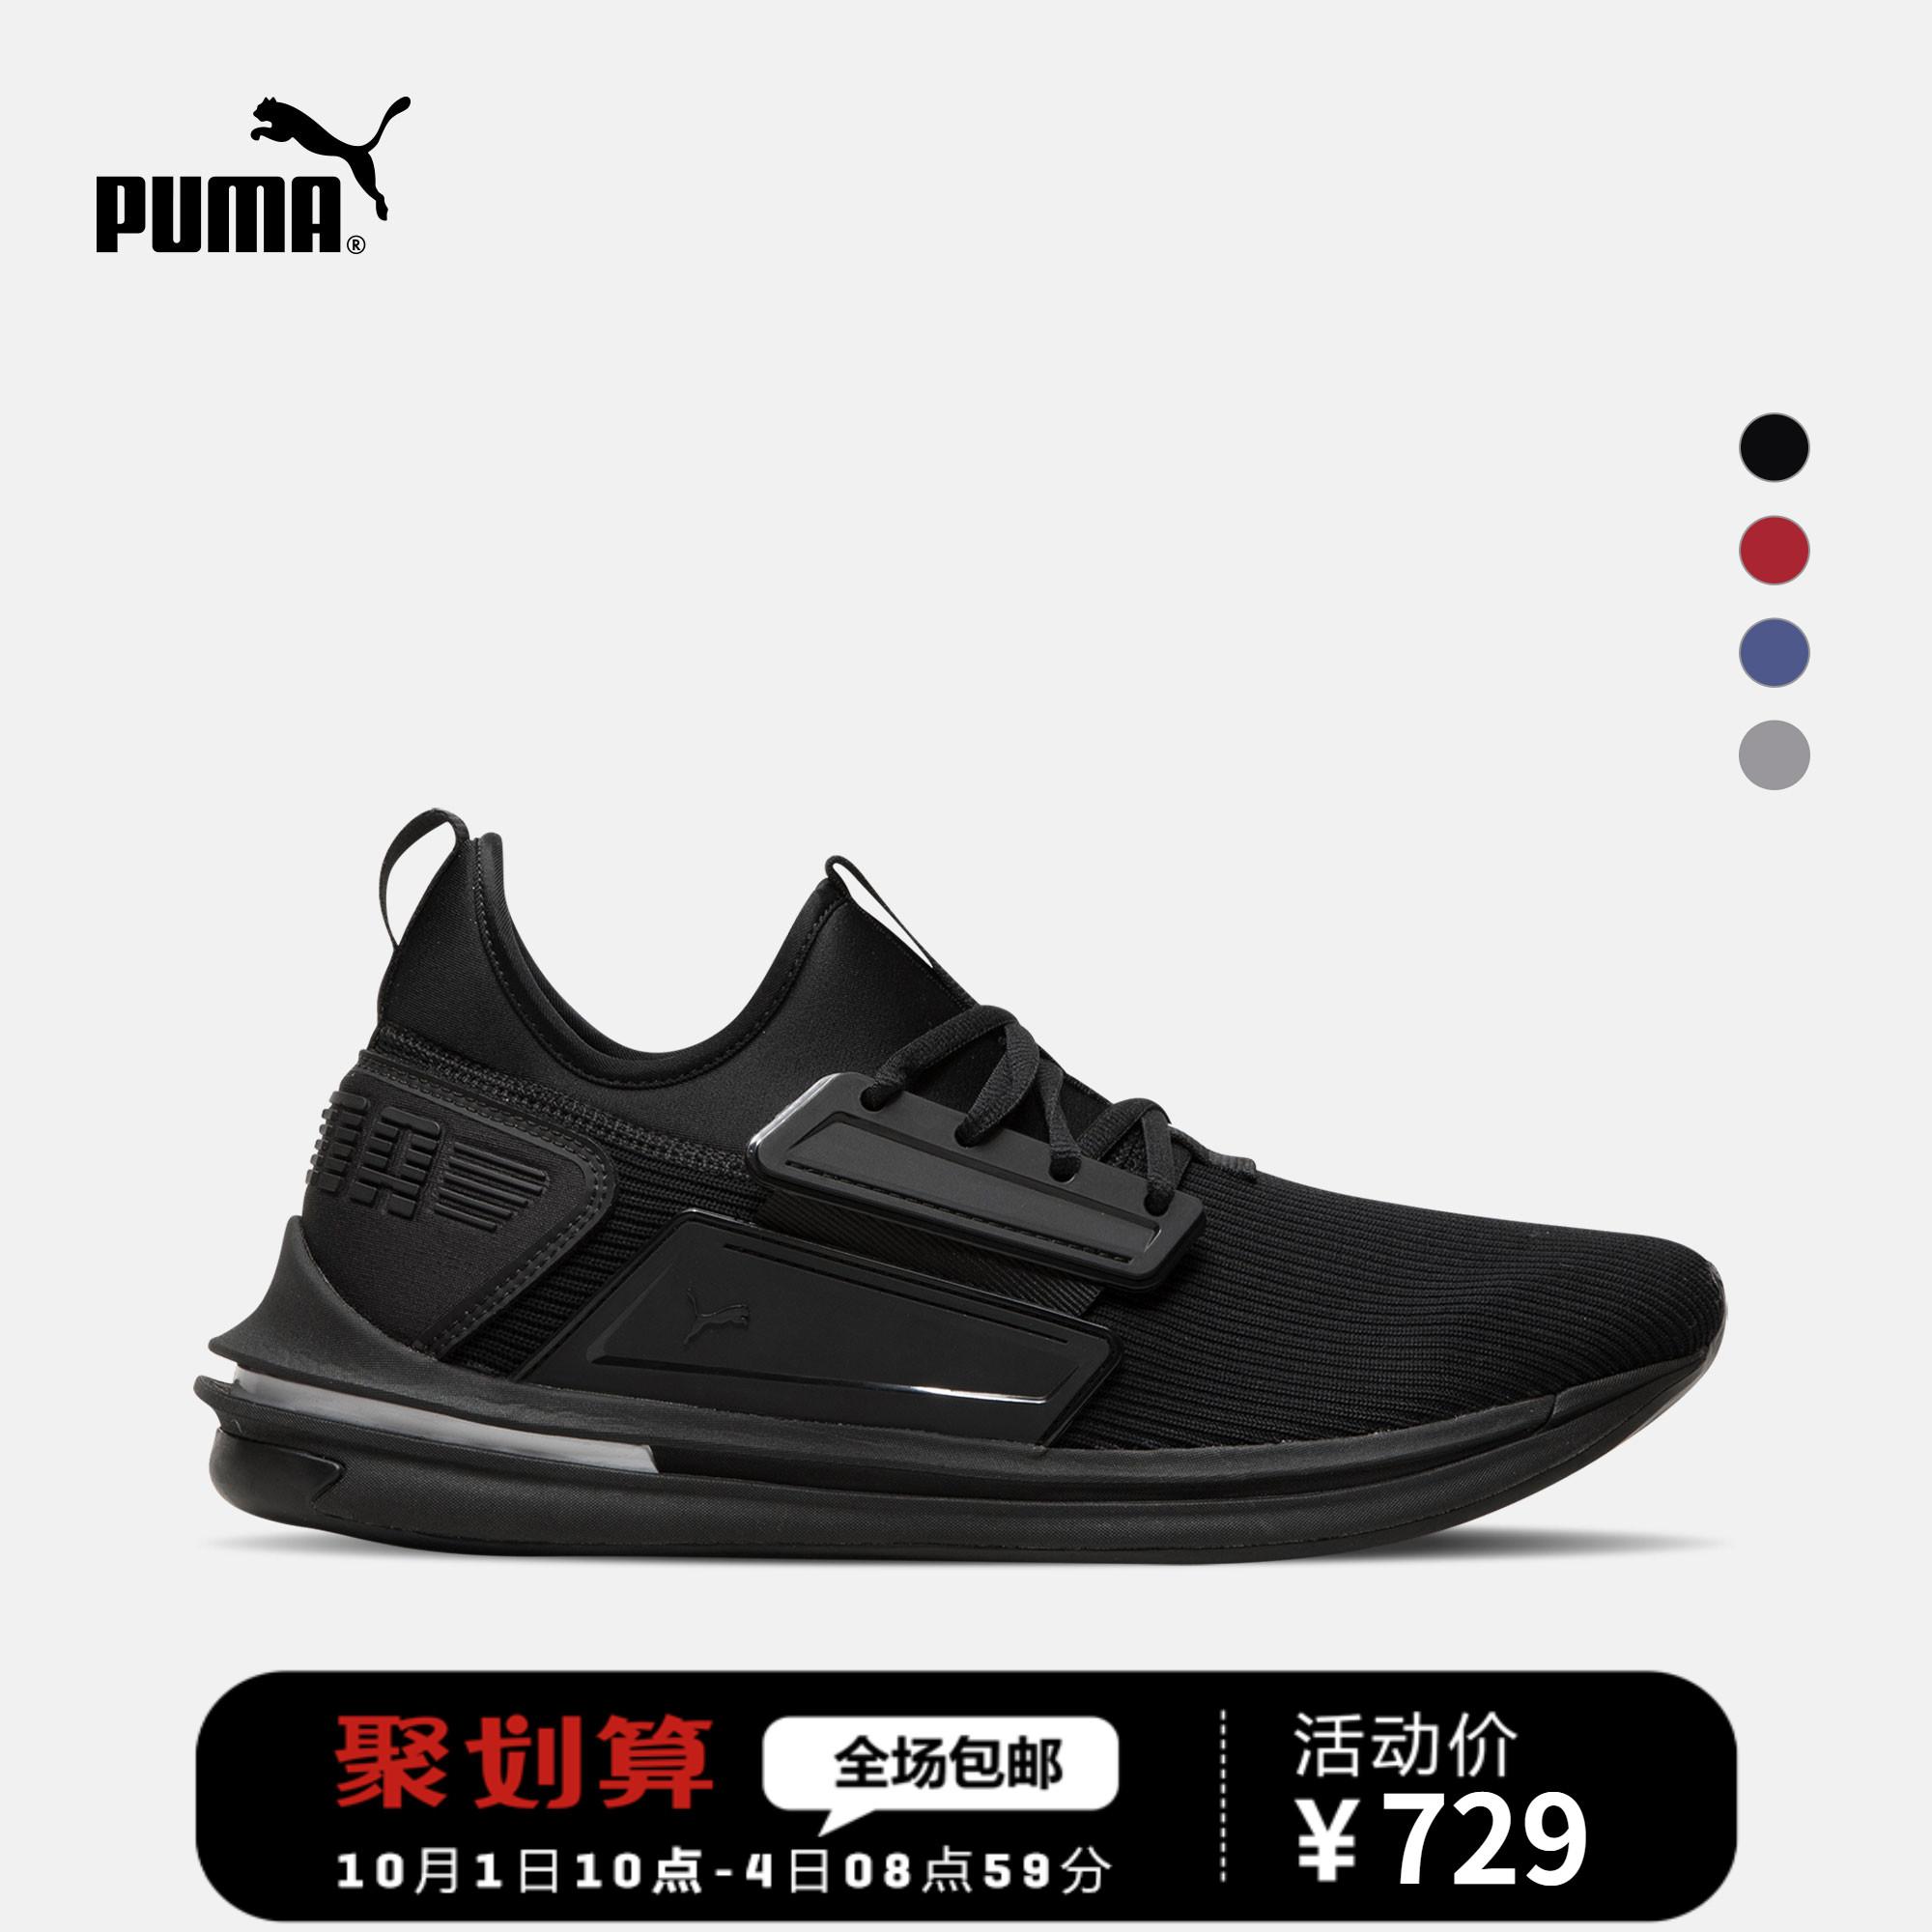 PUMA彪马官方 杨洋同款 男子跑步鞋 IGNITE Limitless SR 190482